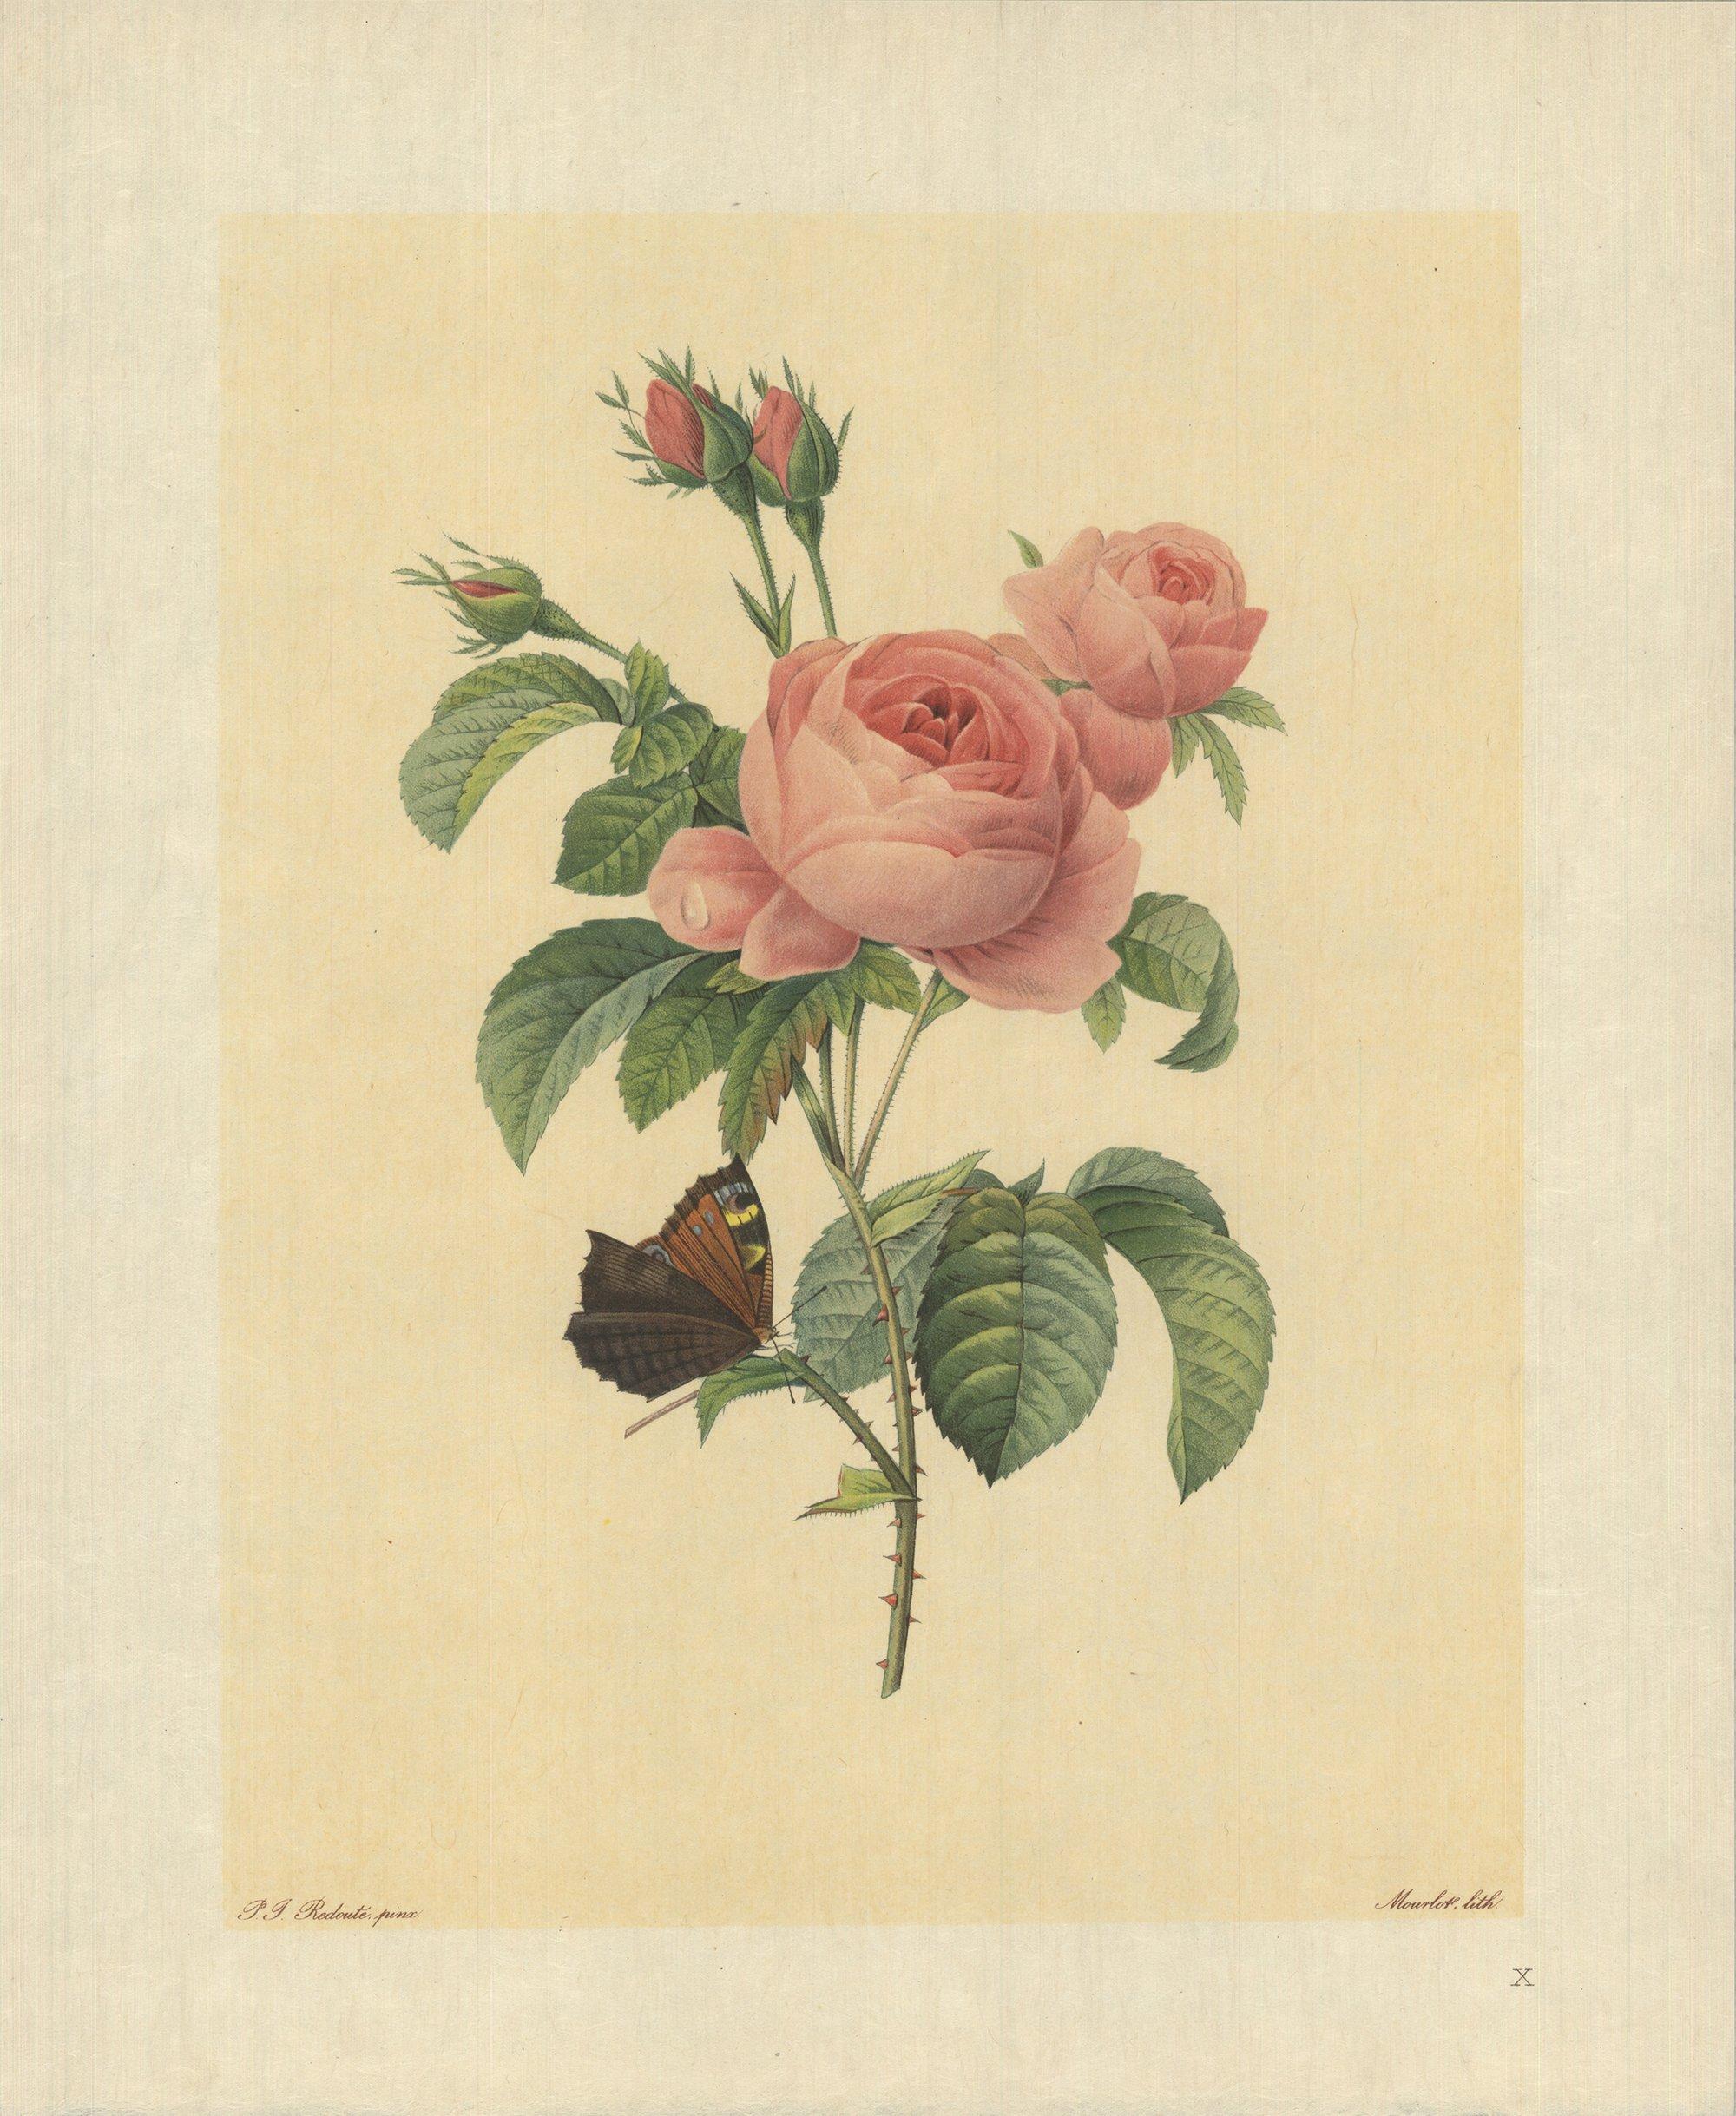 1939 Pierre-Joseph Redoute 'Rosier a Cent Feuilles (Rosa Centifolia)' Lithograph